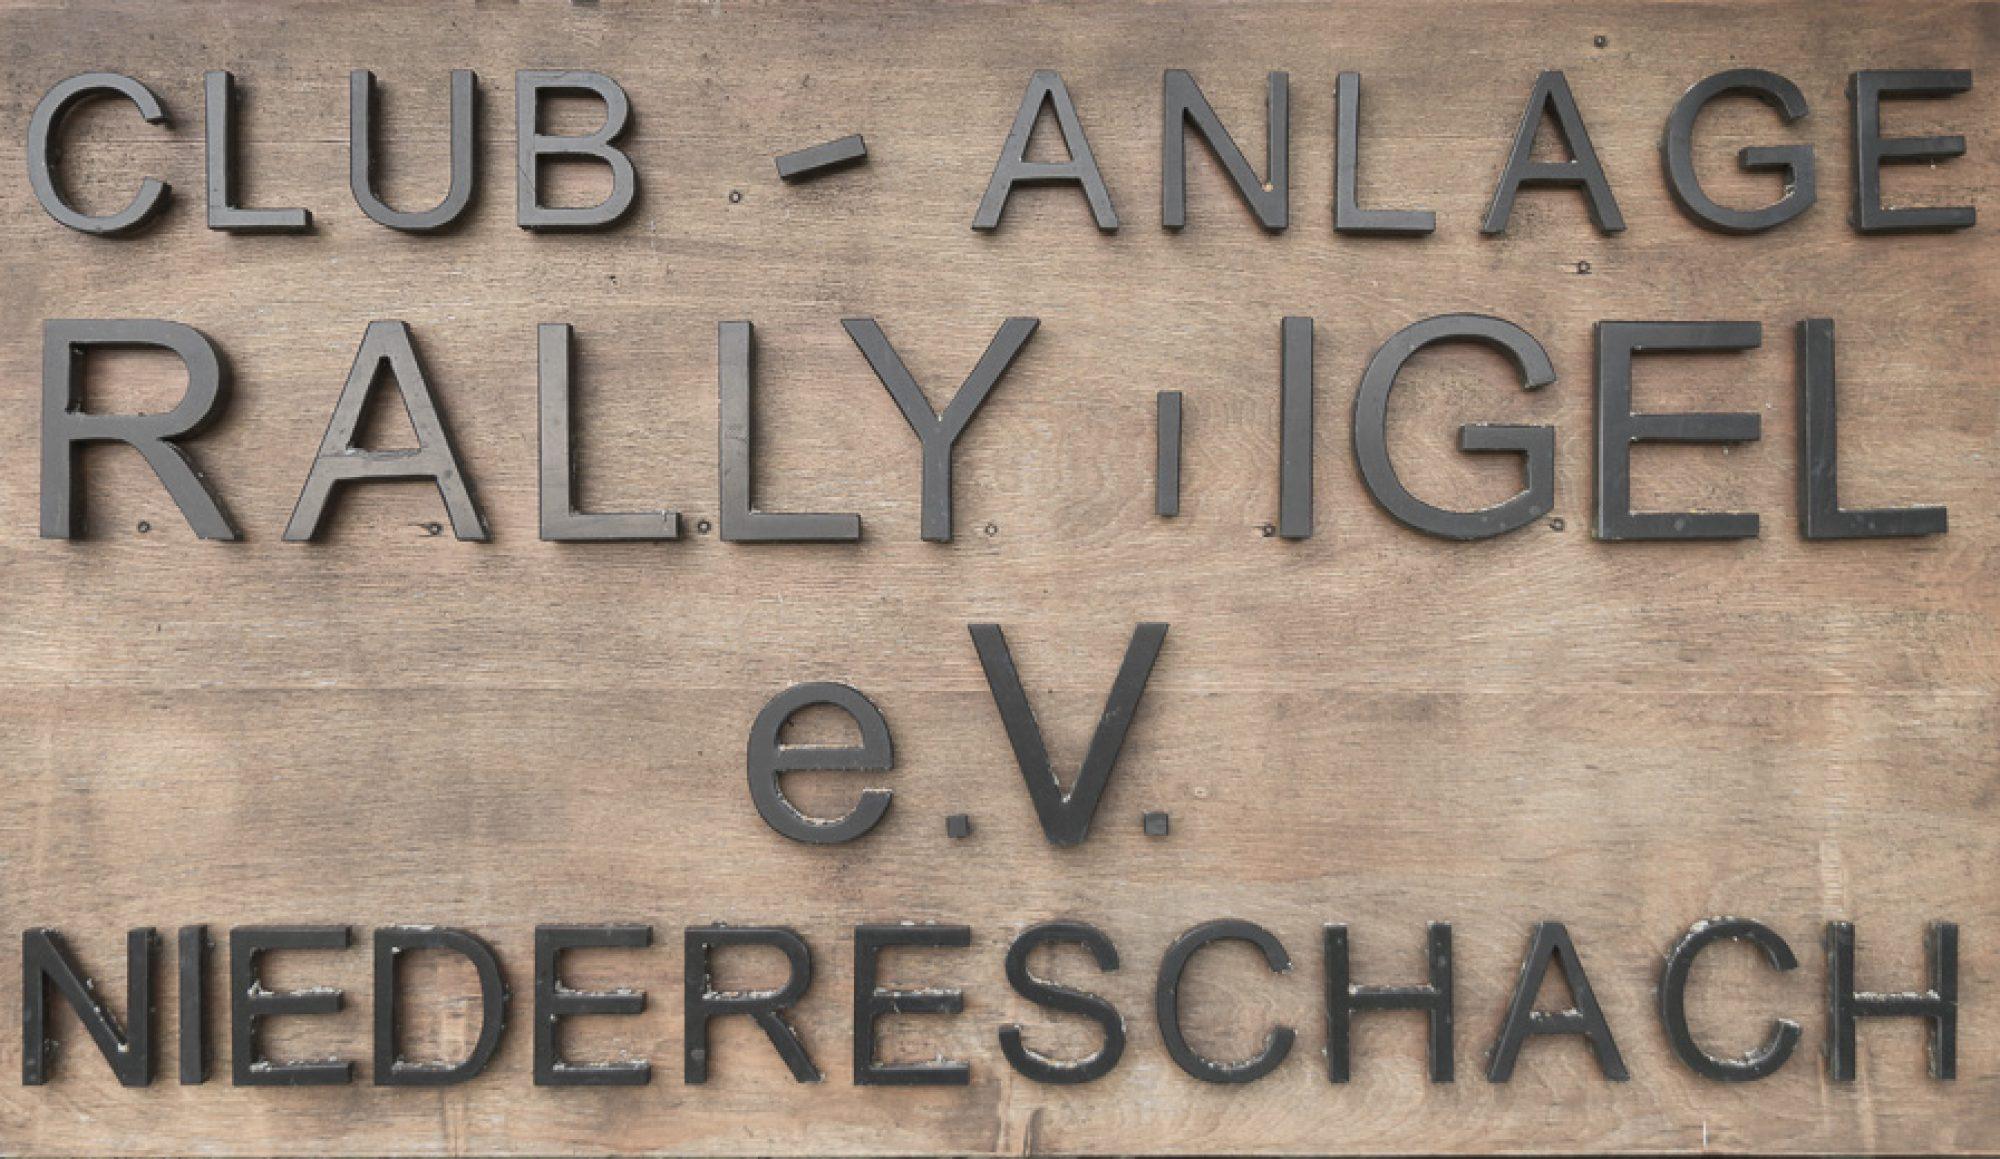 Caravan- und Zeltsportclub Niedereschach Rally Igel e.V.